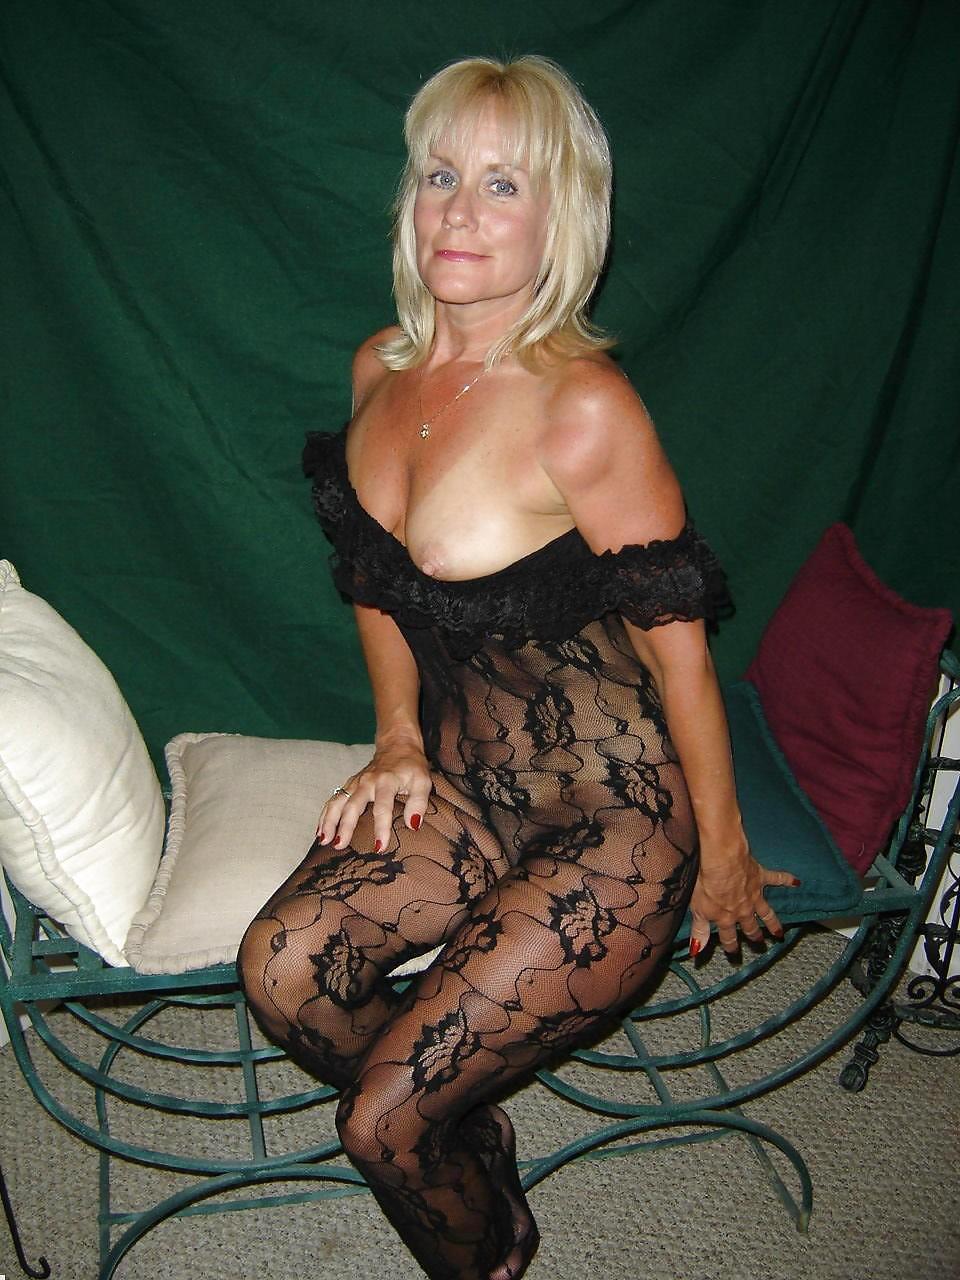 http://hotamateurmature.com/gallery/Housewives_milf_mature_elders/1.jpg